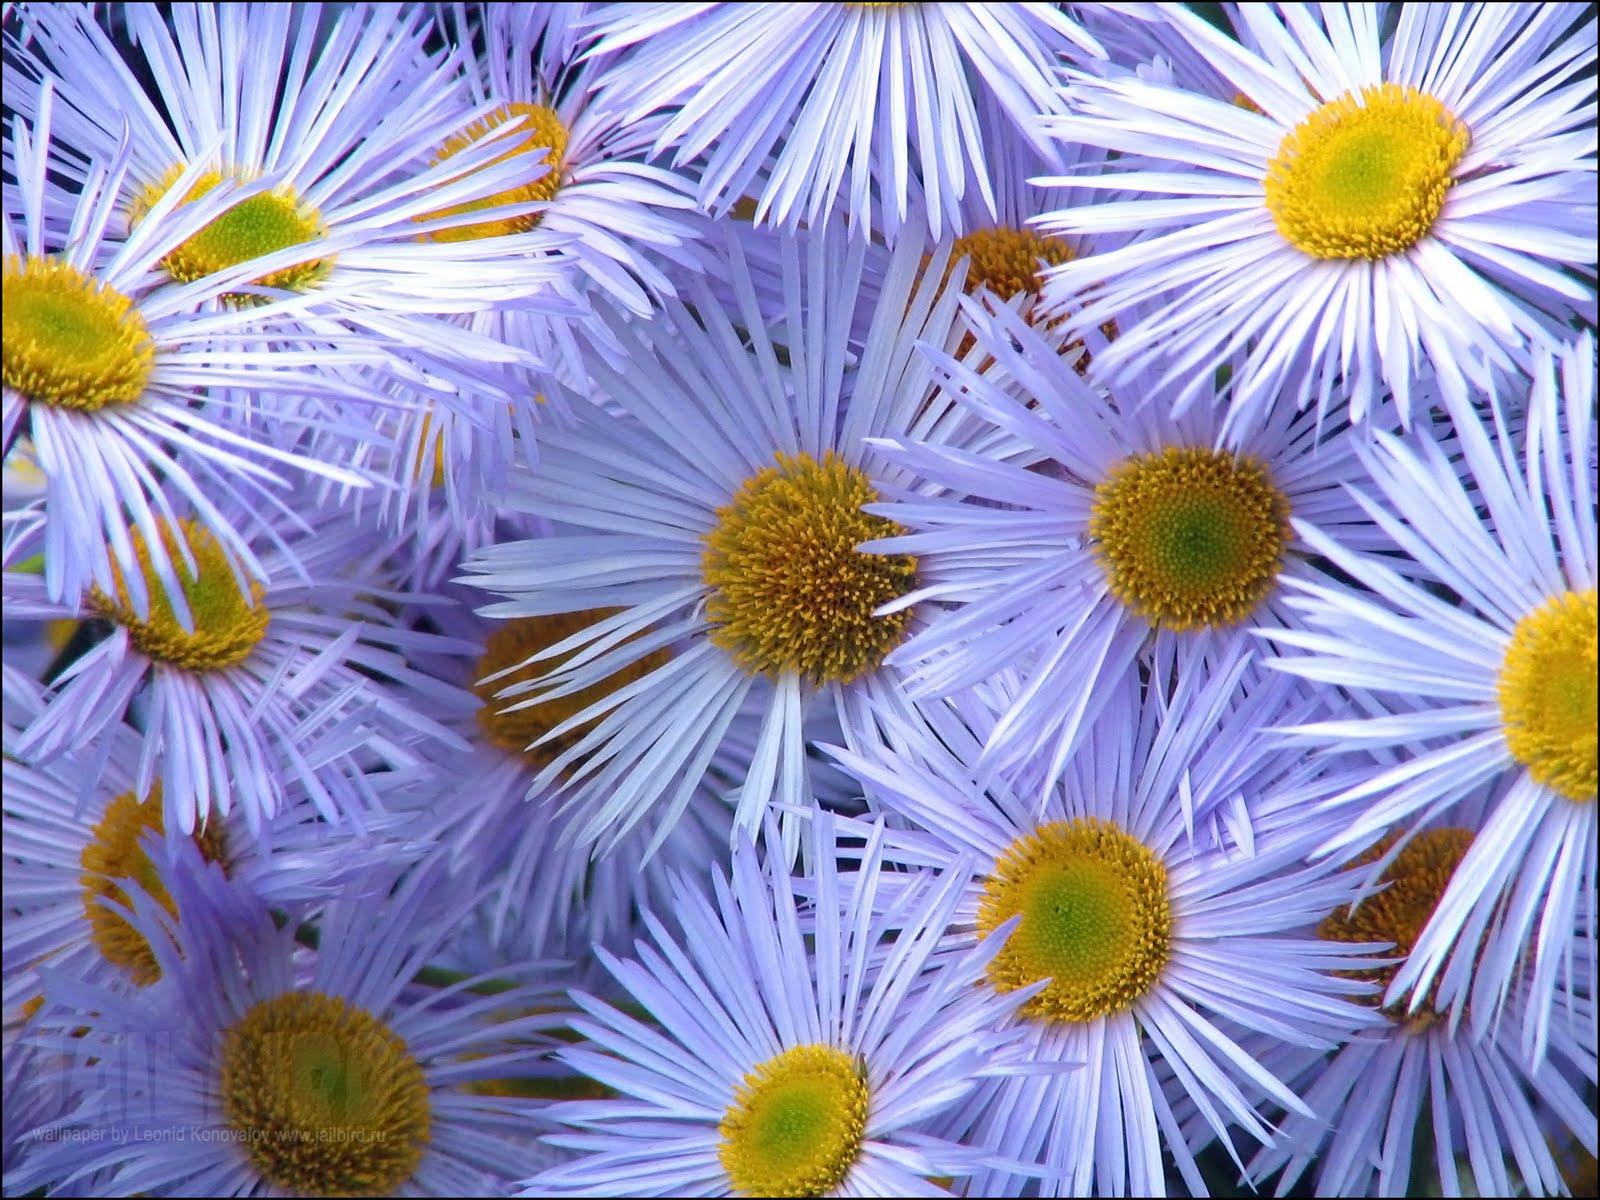 Free Desktop Wallpaper Flower Scenes - WallpaperSafari